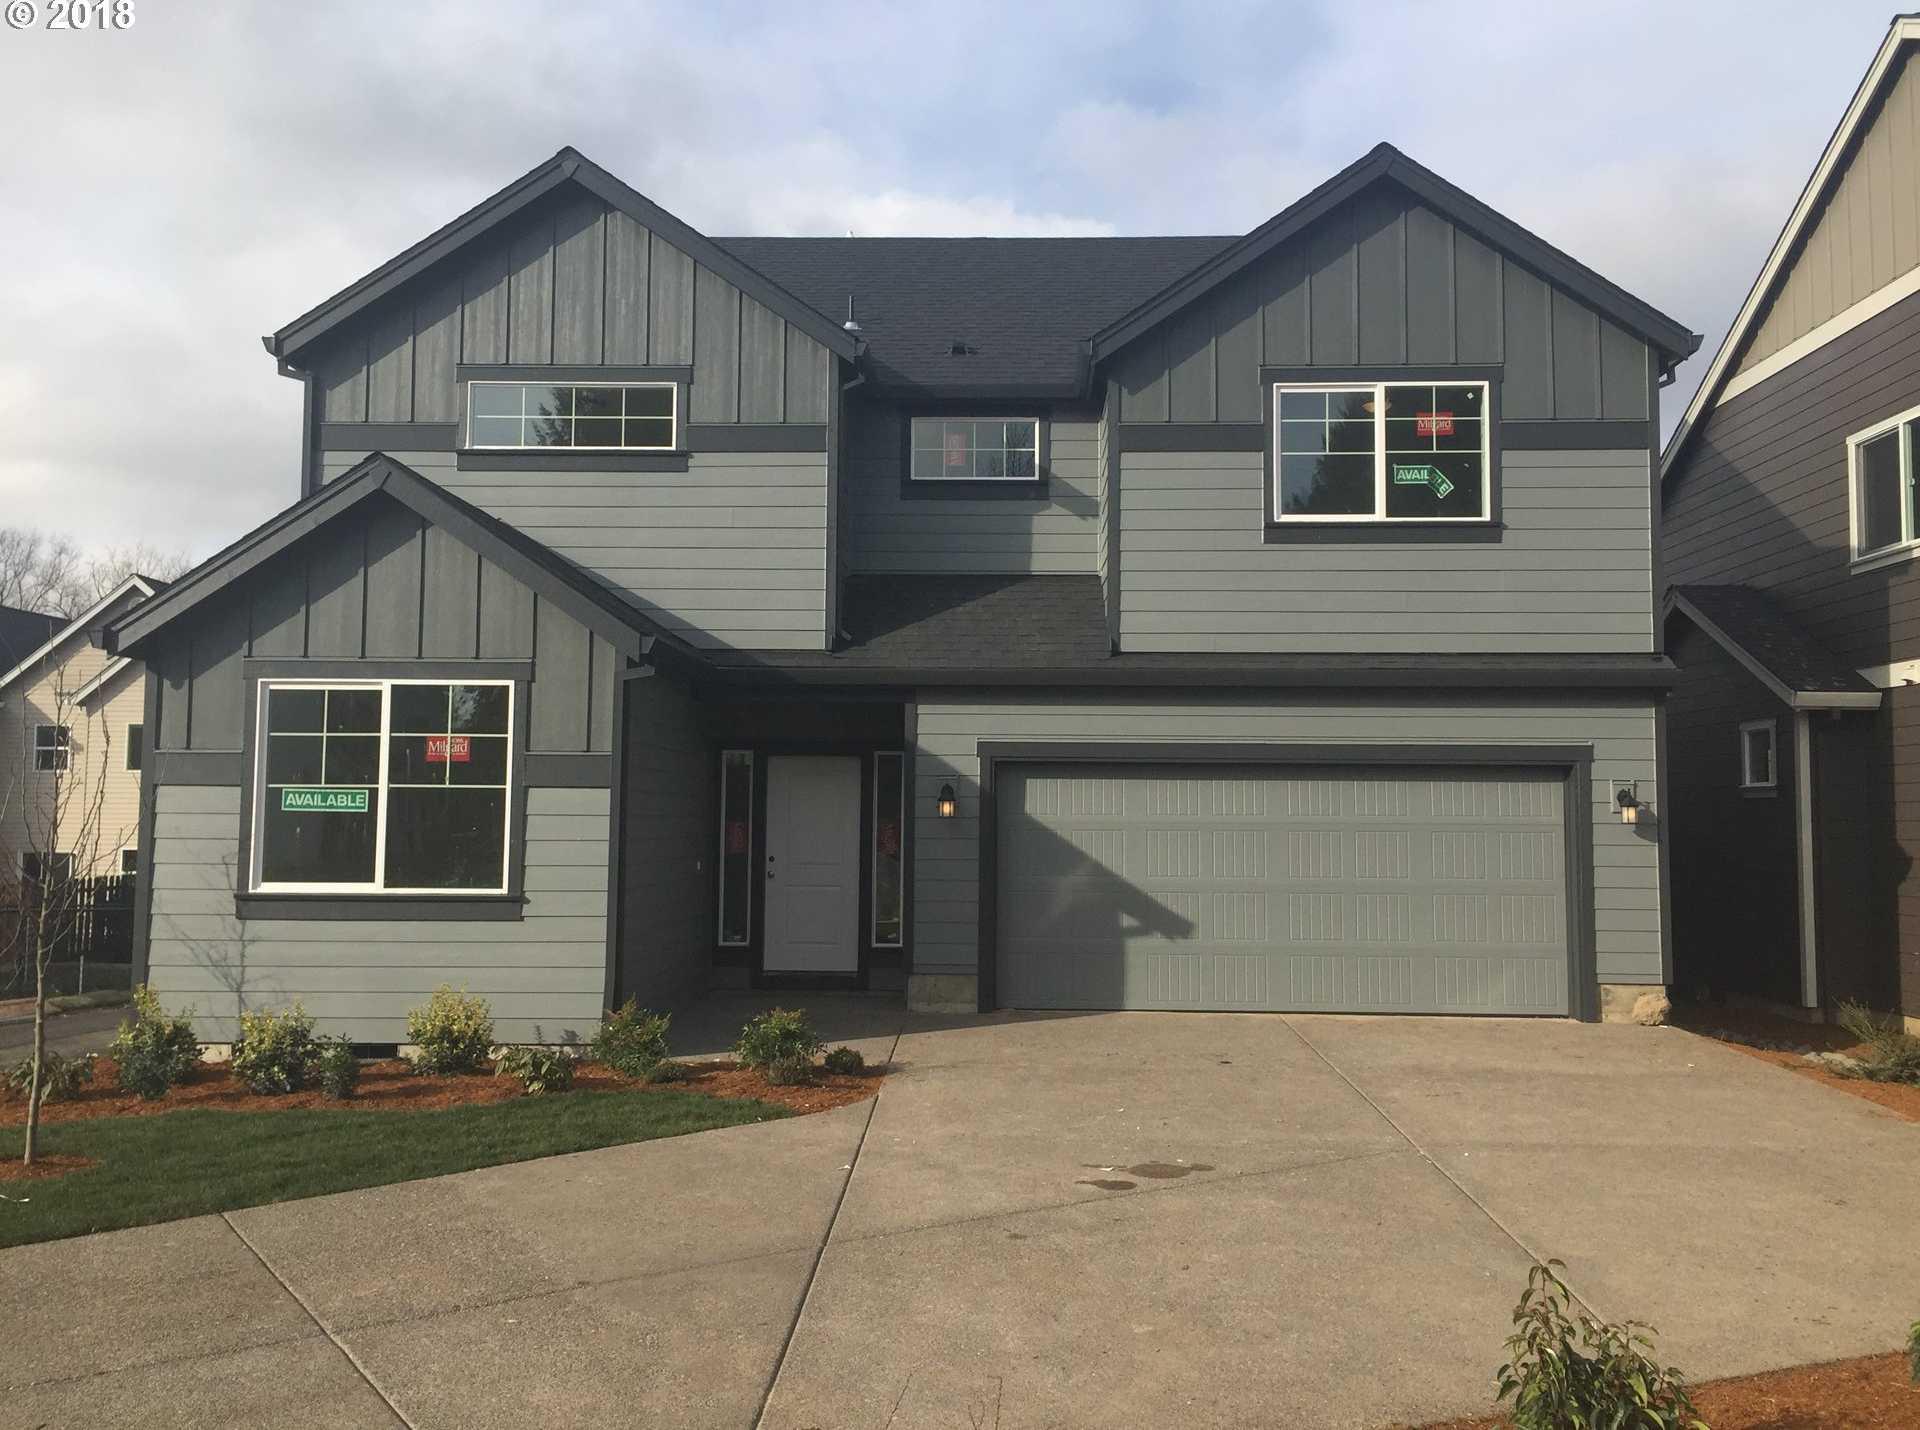 $434,950 - 4Br/3Ba -  for Sale in Freya Brooke, Beaverton